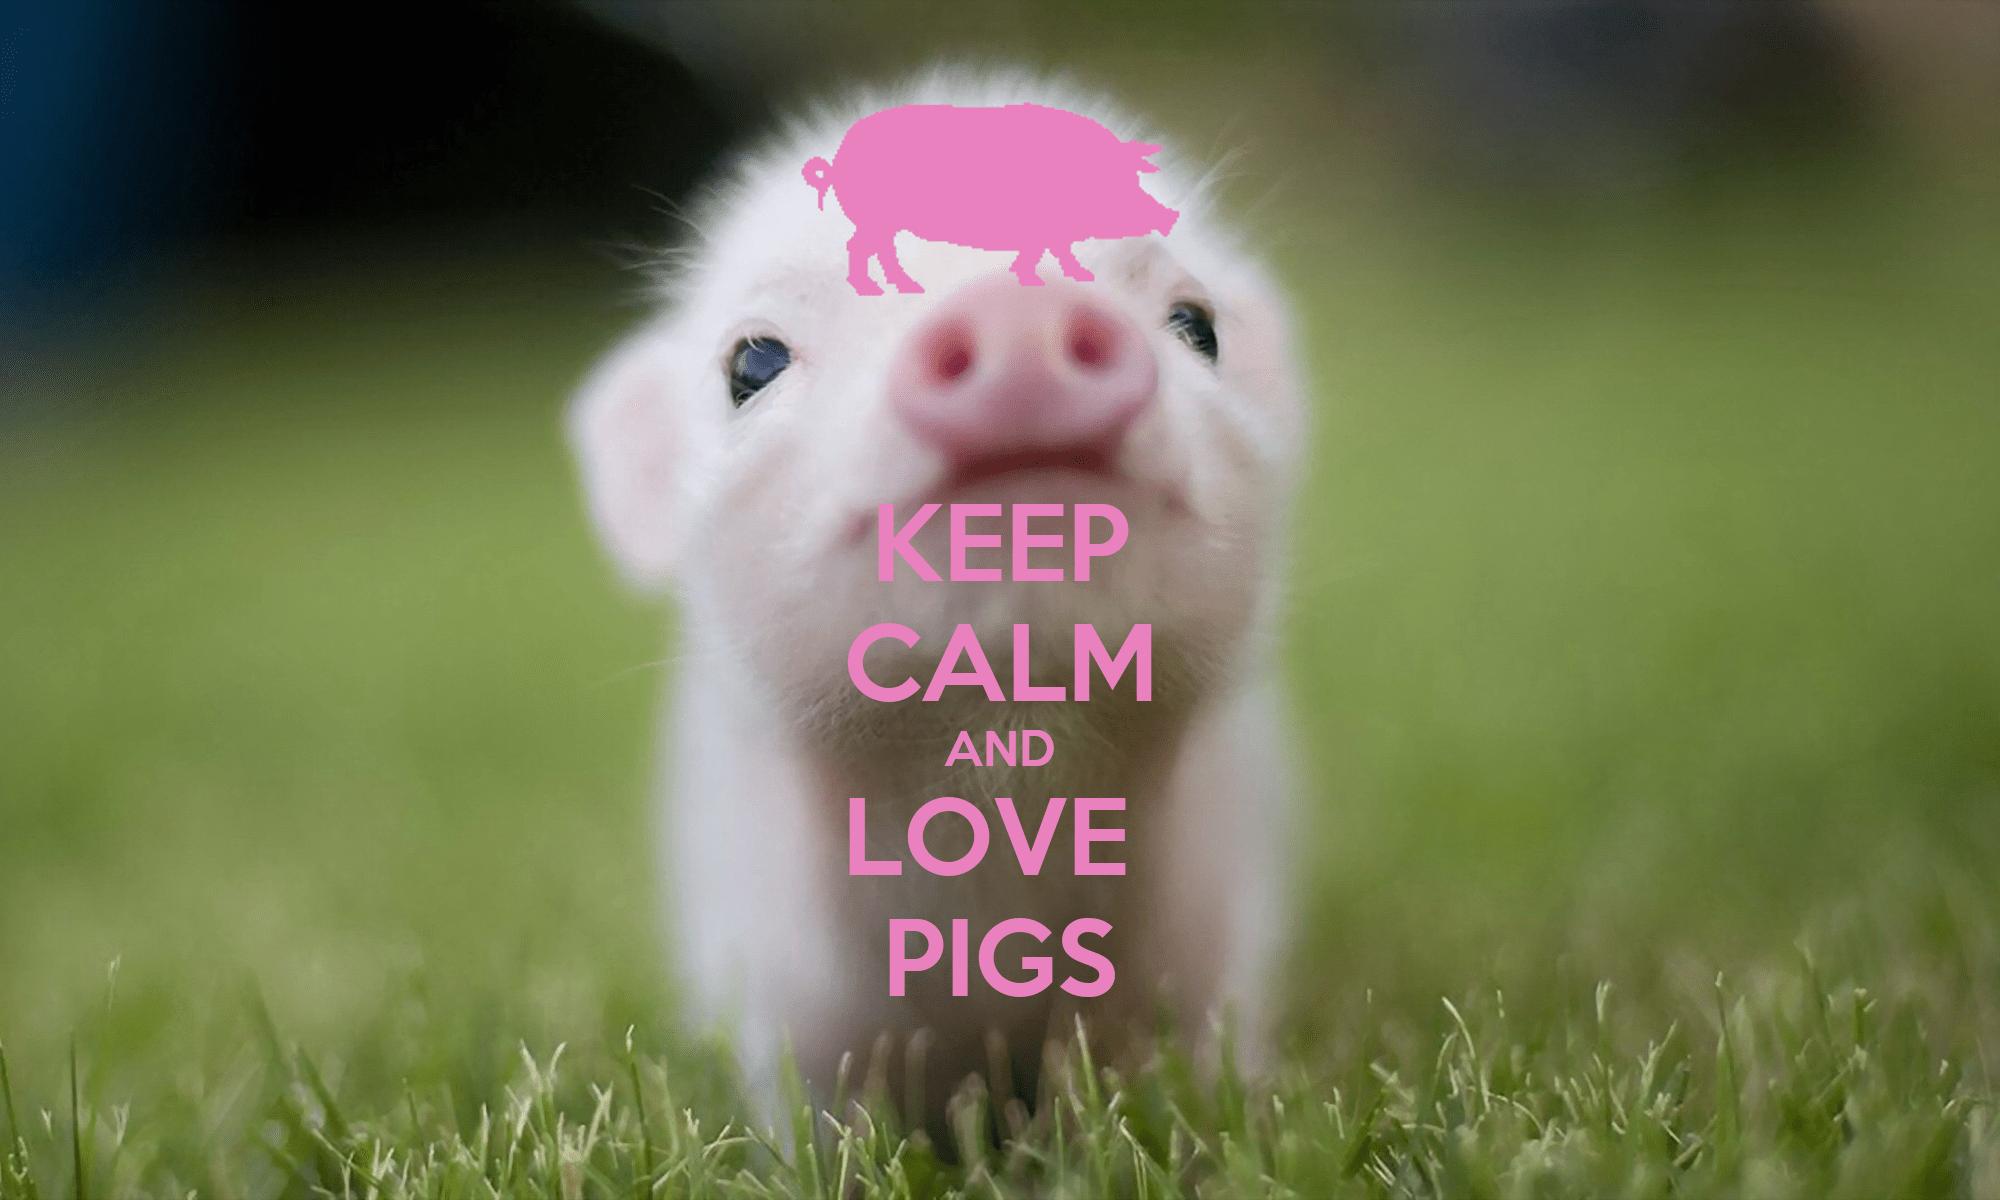 Cute Piglets Wallpaper Keep Calm And Love Pigs Poster Josh Keep Calm O Matic